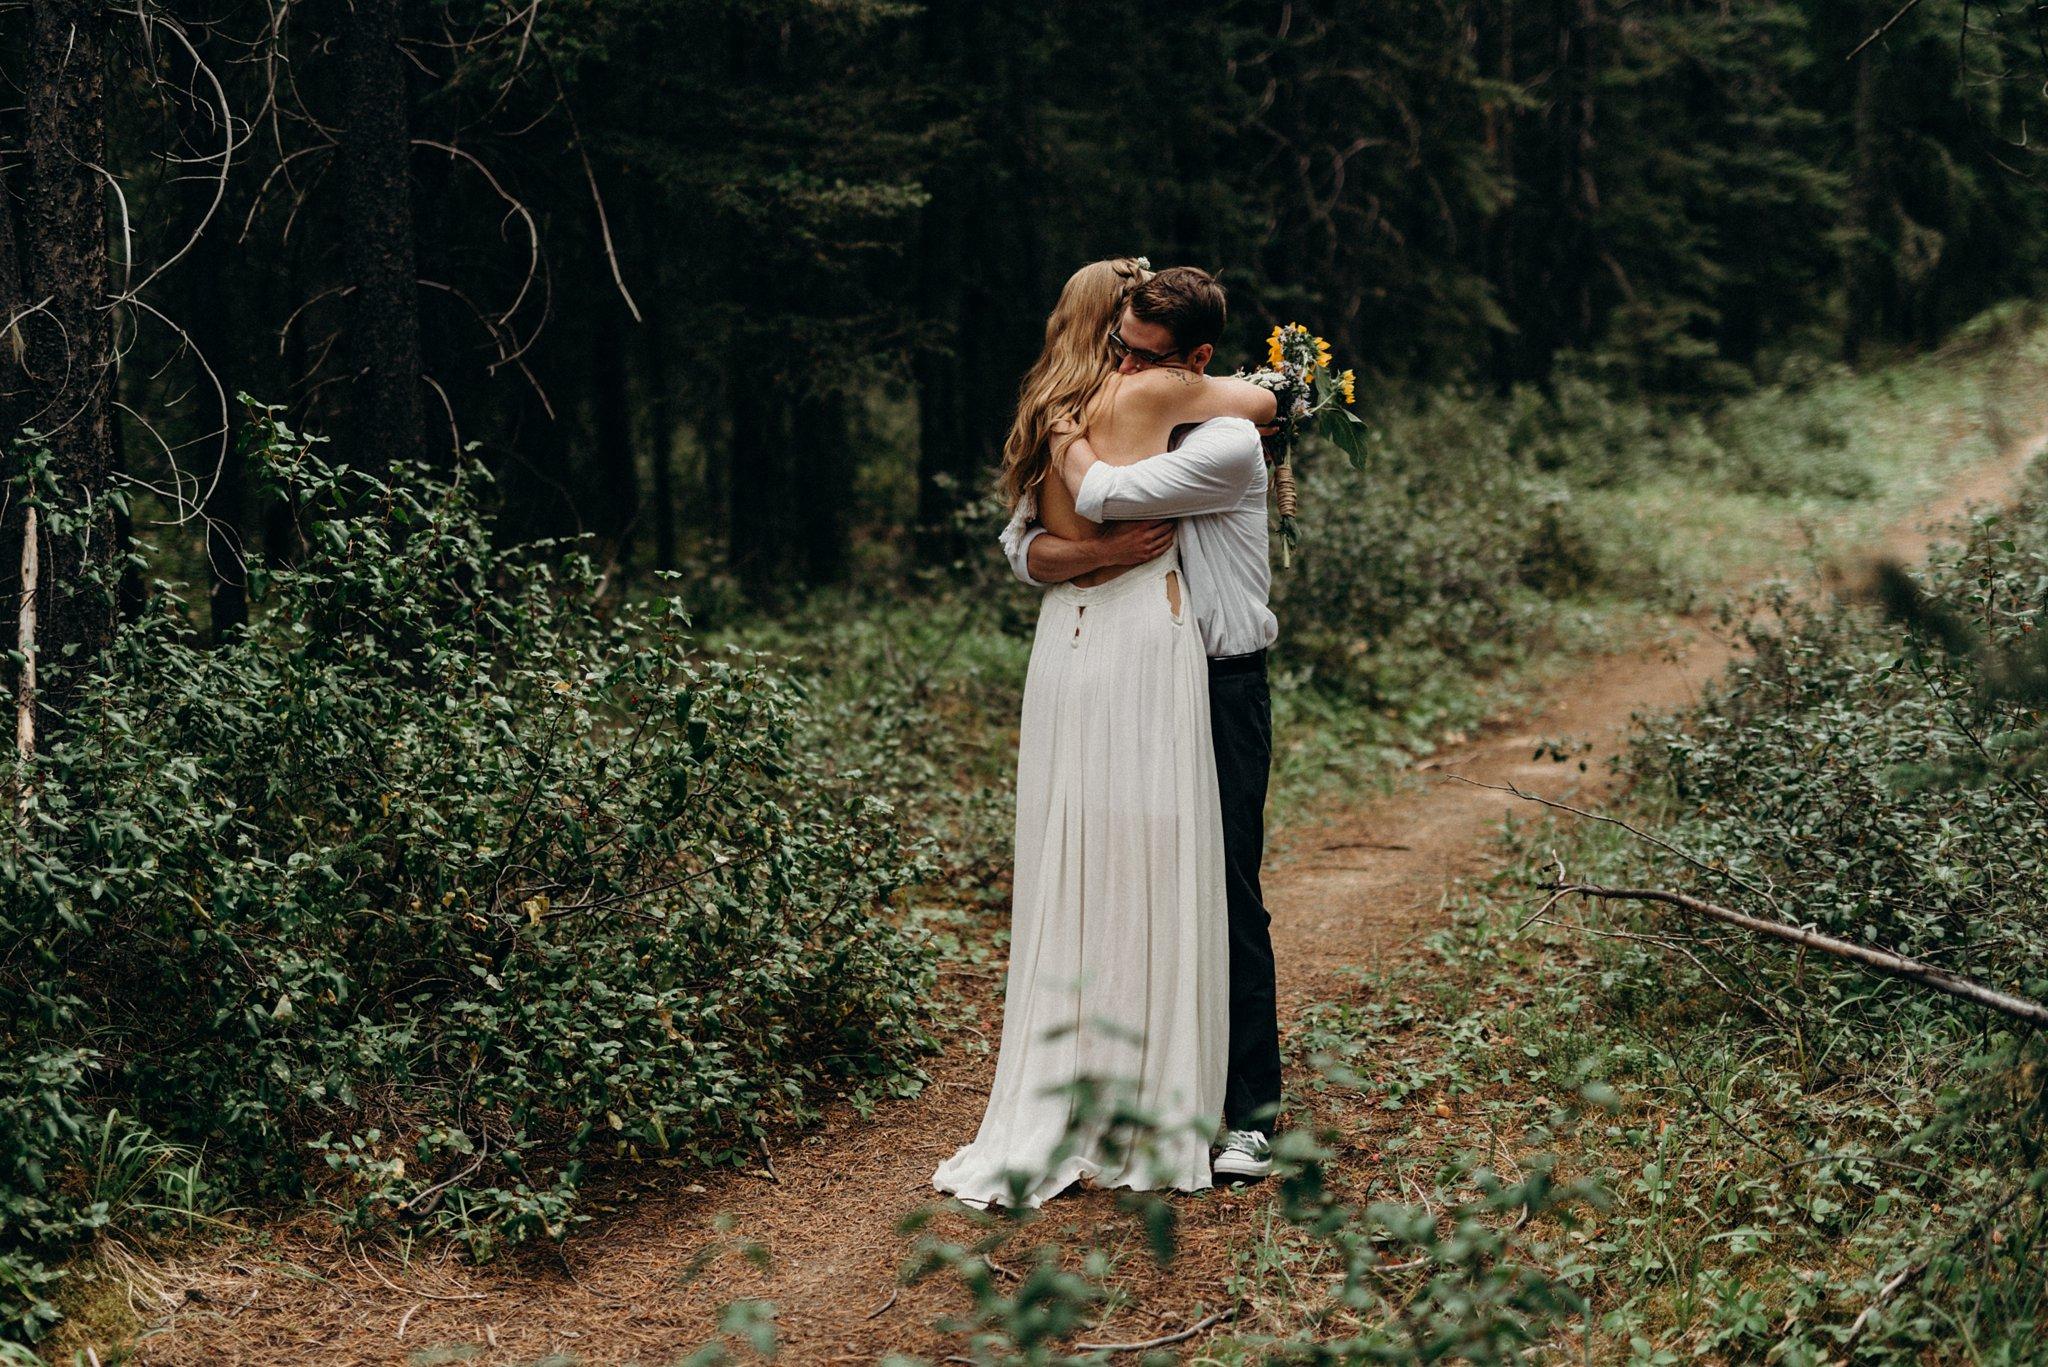 kaihla_tonai_intimate_wedding_elopement_photographer_6364.jpg